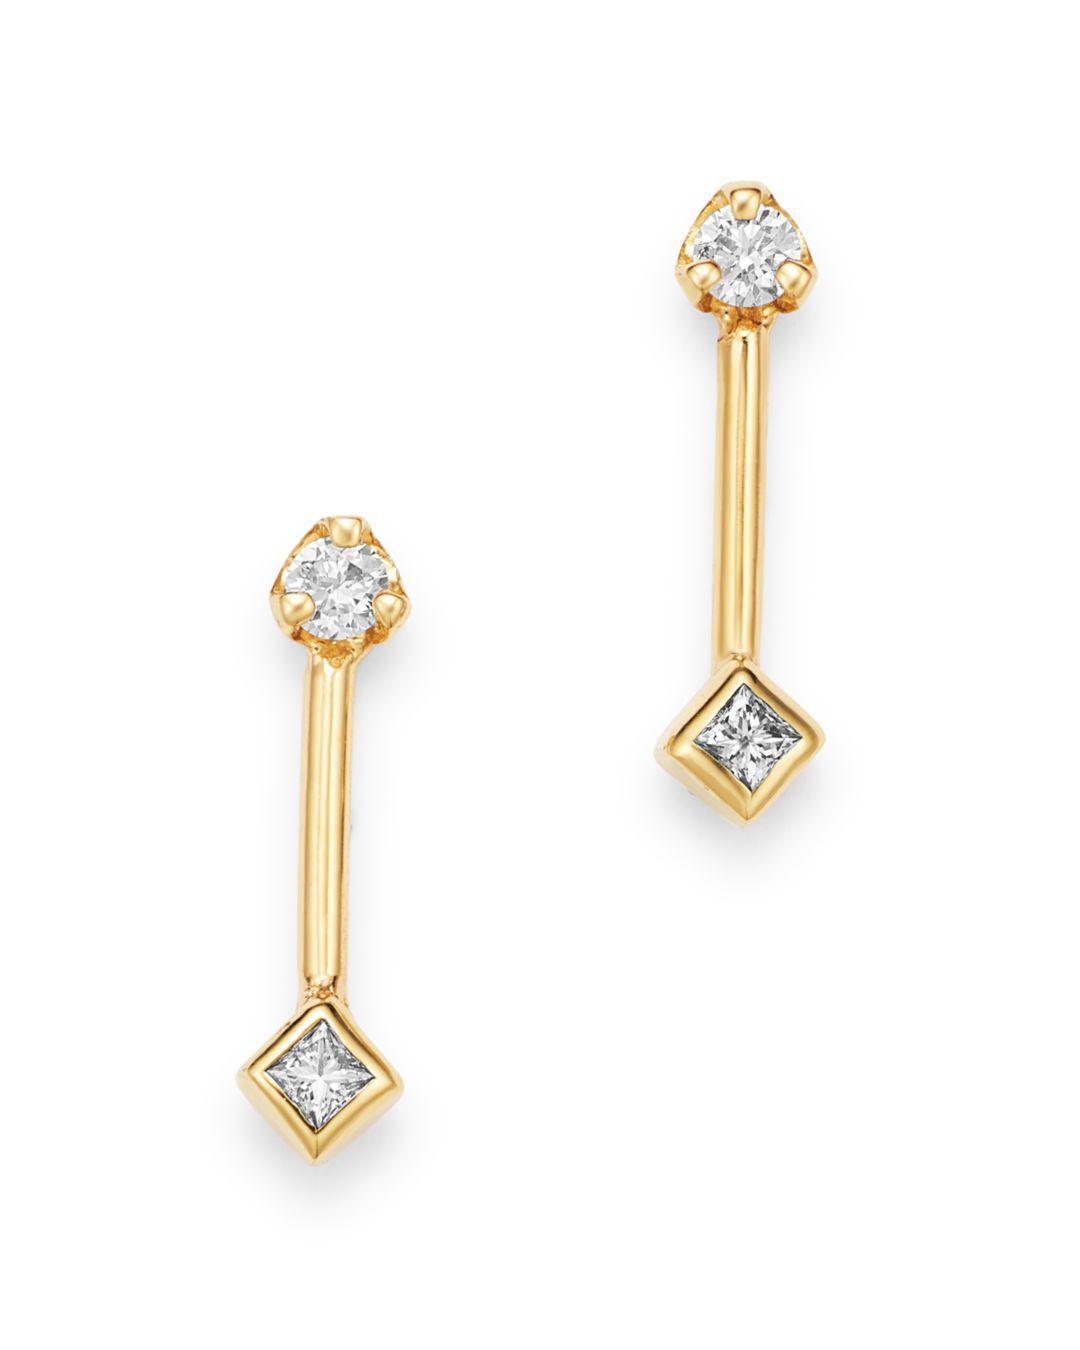 5fb425f82369a Lyst - Zoe Chicco 14k Yellow Gold Diamond Barbell Stud Earrings in ...